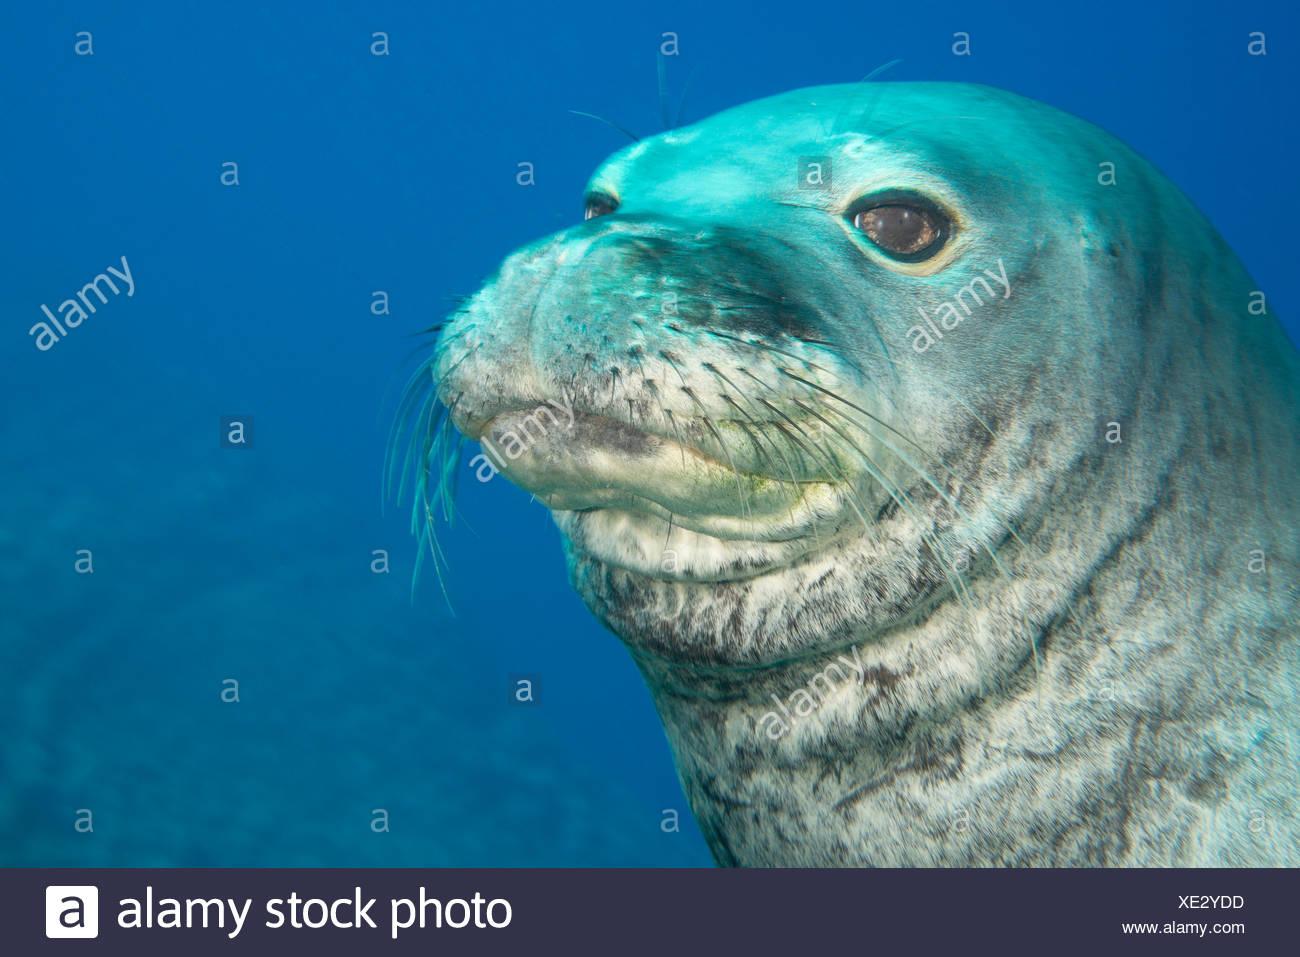 Male Hawaiian monk seal (Monachus schauinslandi)  at Lehua Ledges dive site, Lehua Rock, near Niihau, off Kauai, Hawaii - Stock Image